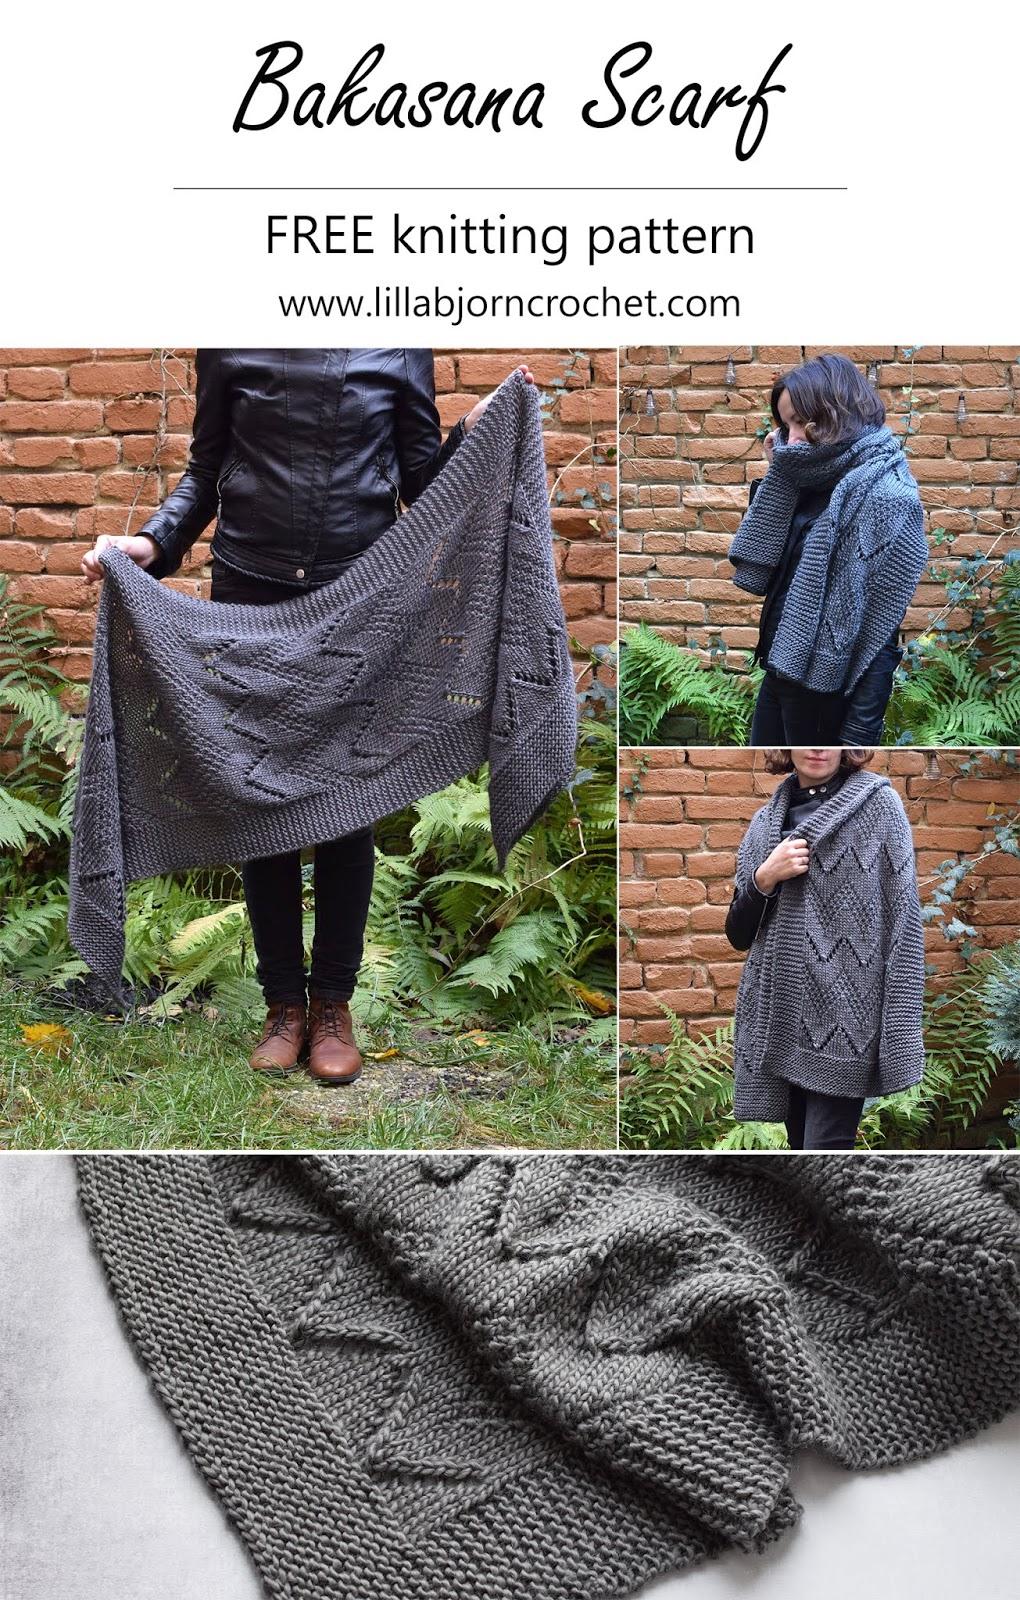 Bakasana Scarf Free Knitting Pattern Lillabjorn S Crochet World